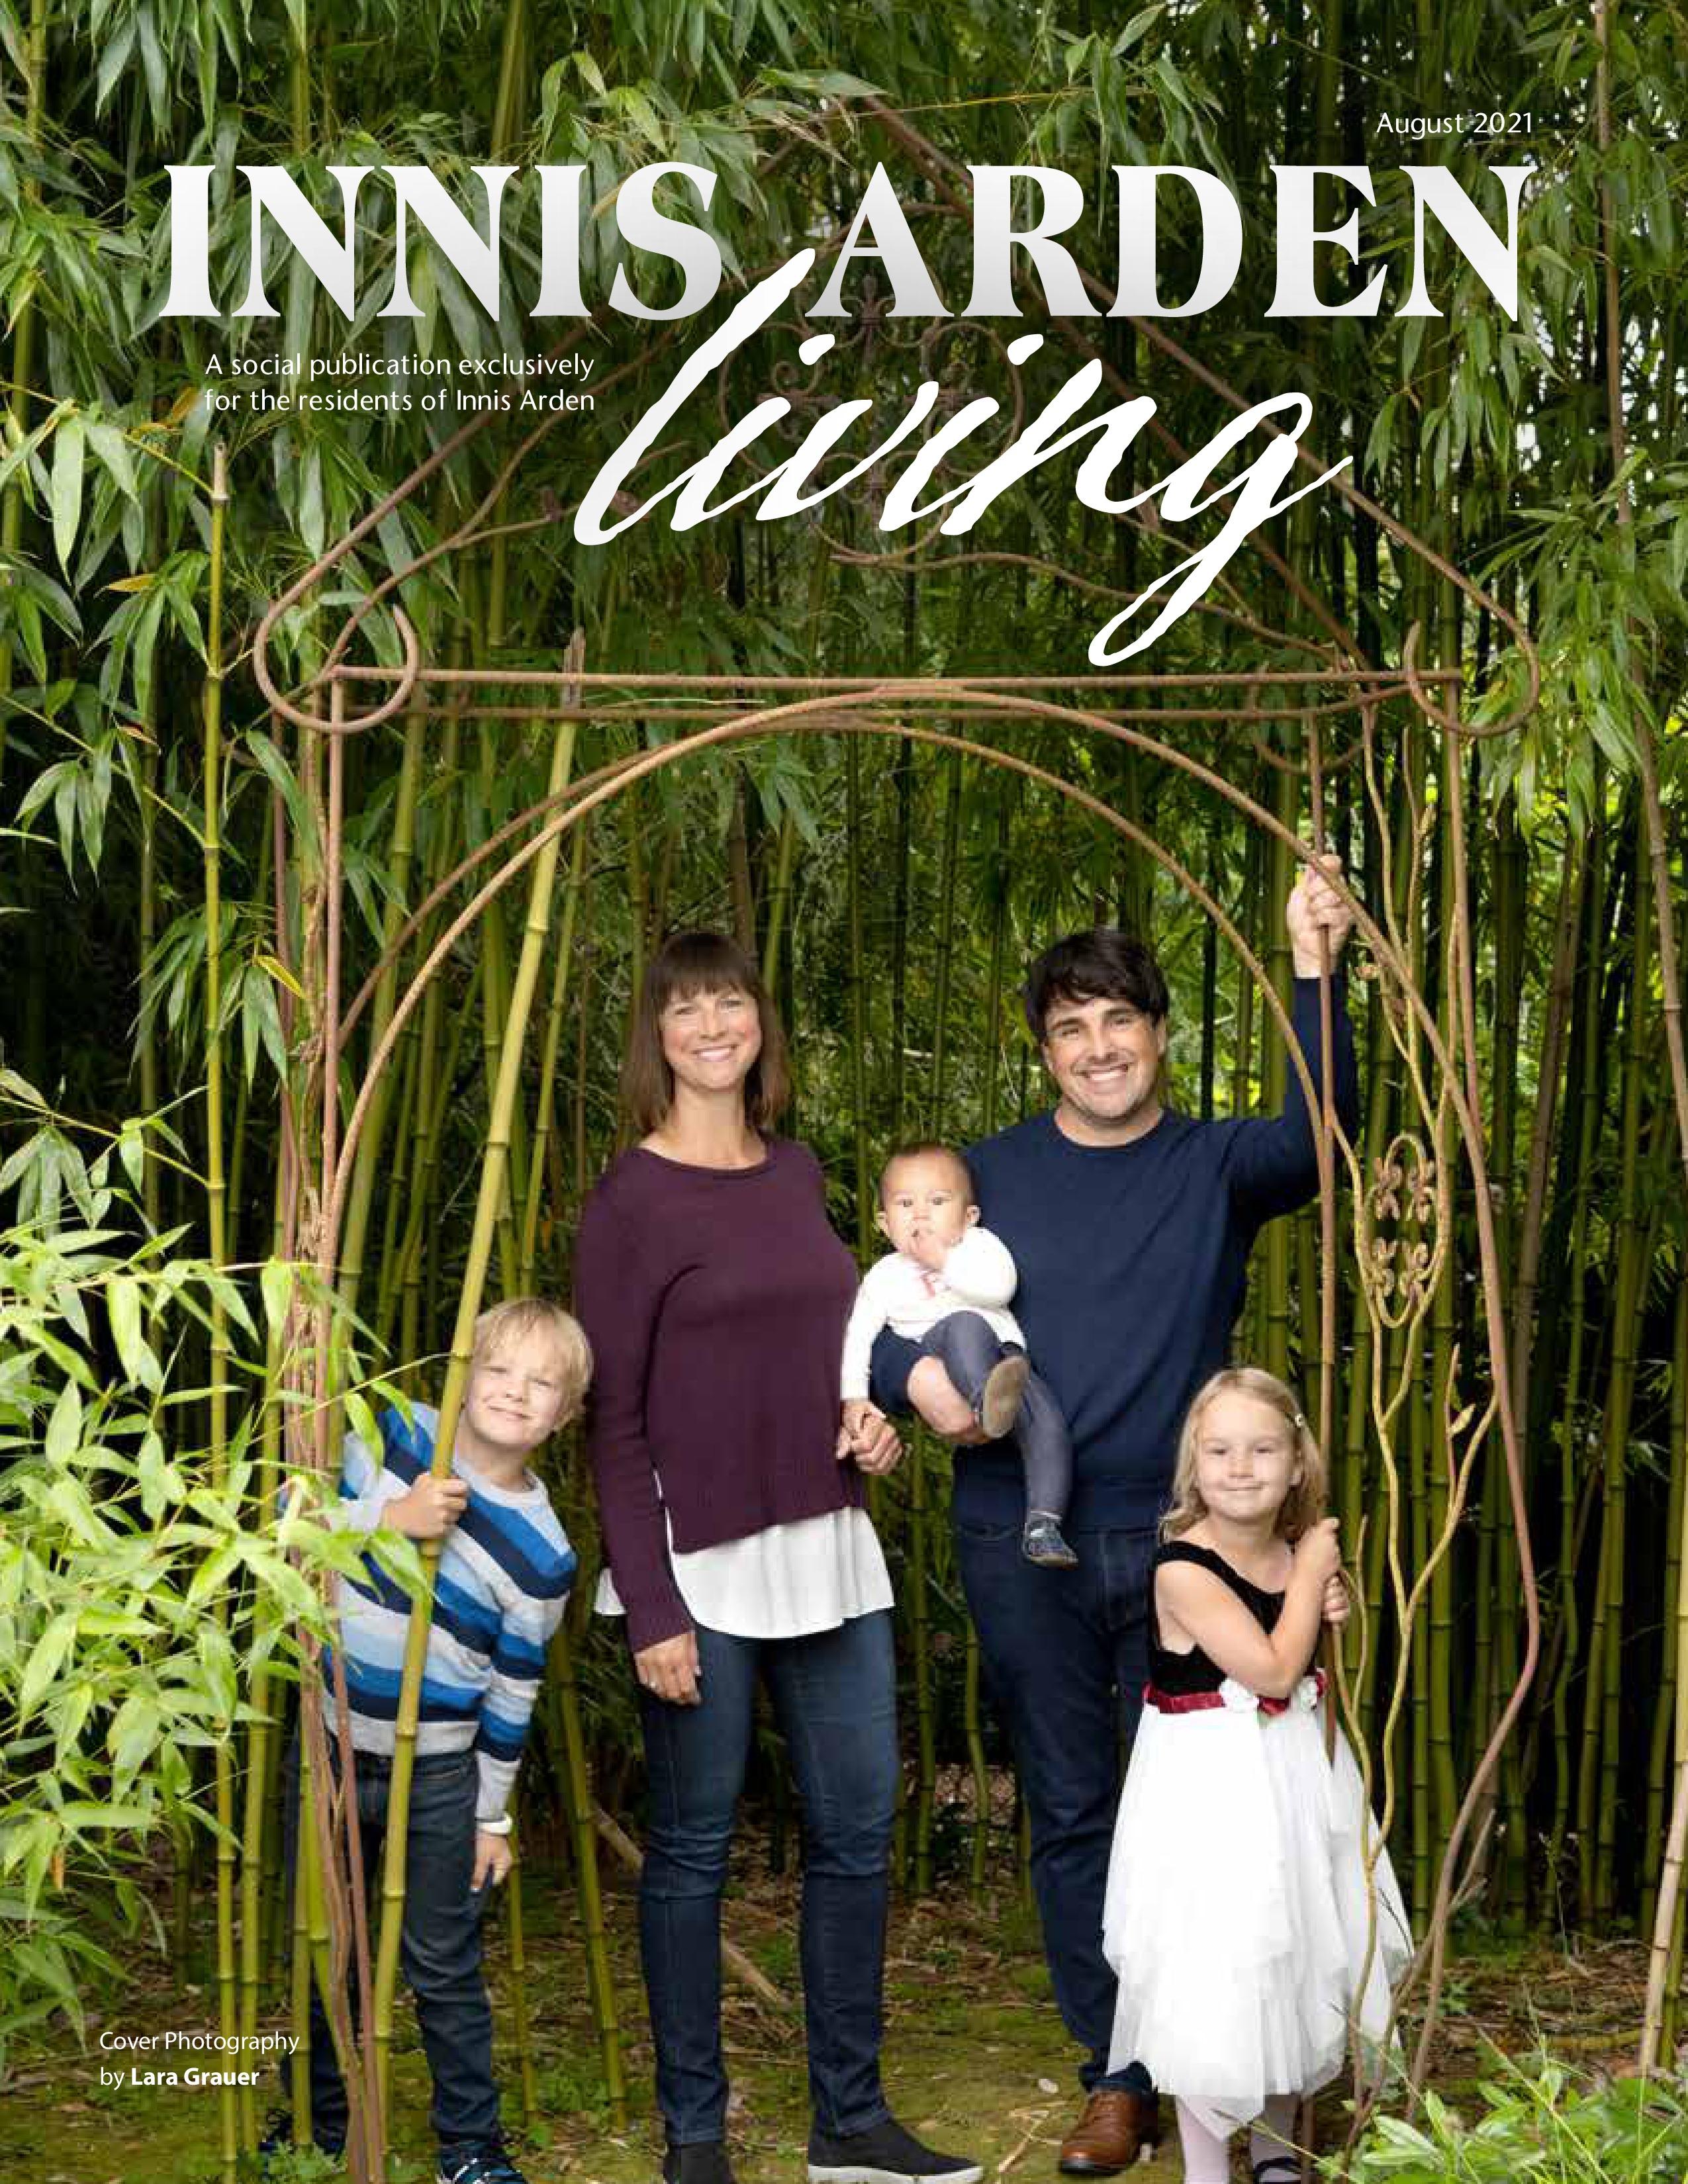 Innis Arden Living 2021-08-01